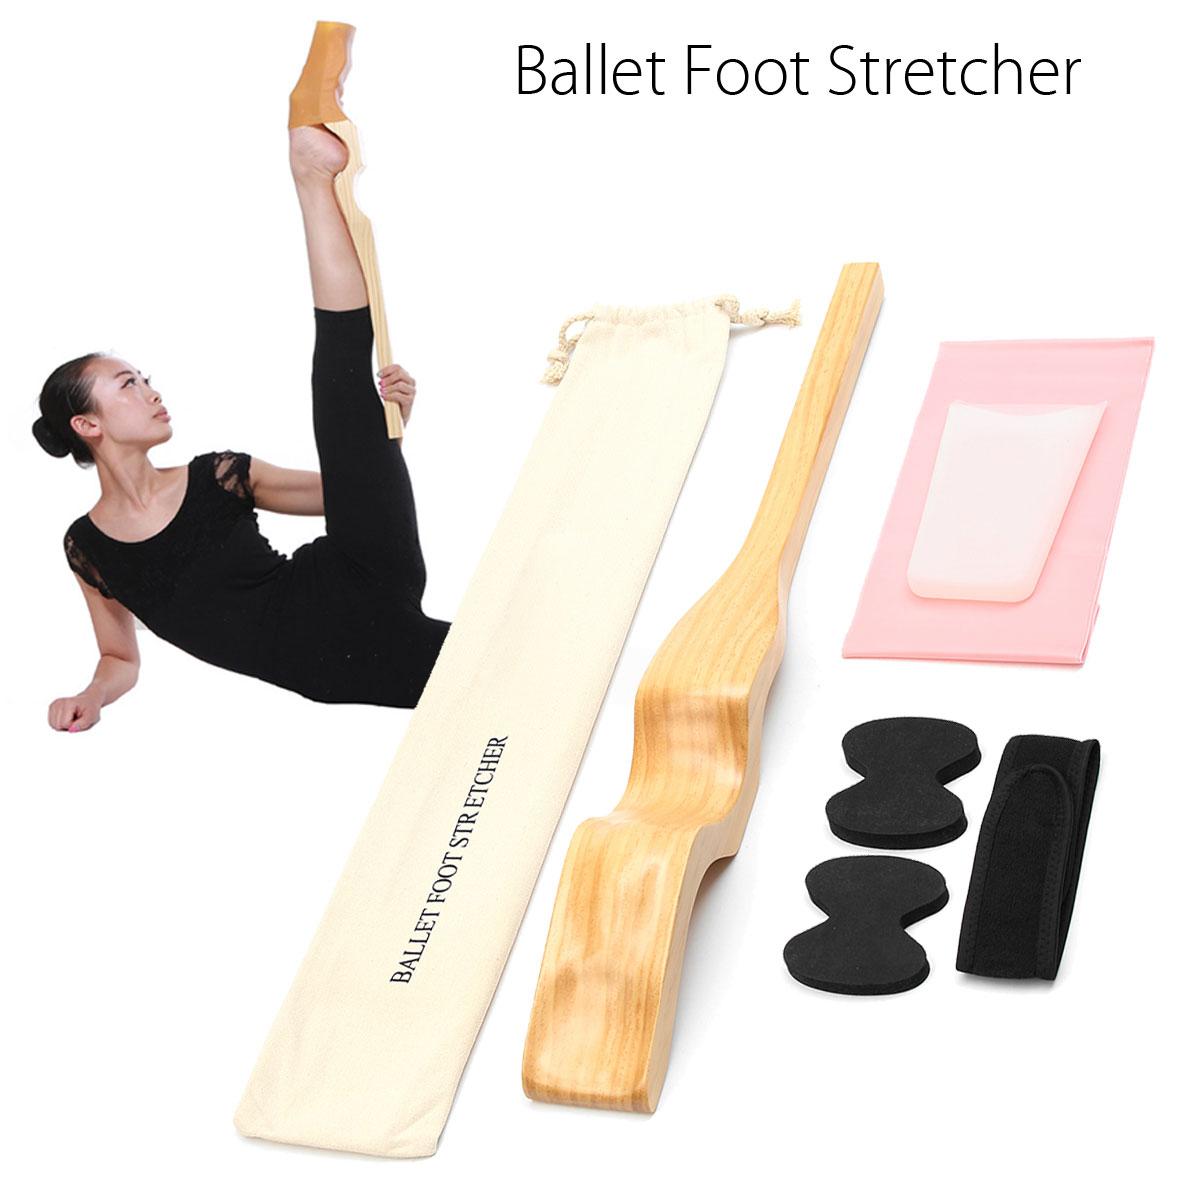 wood-font-b-ballet-b-font-foot-stretch-for-dancer-massage-women-lady-font-b-ballet-b-font-dancing-wooden-arch-enhancer-with-tension-elastic-strap-for-yoga